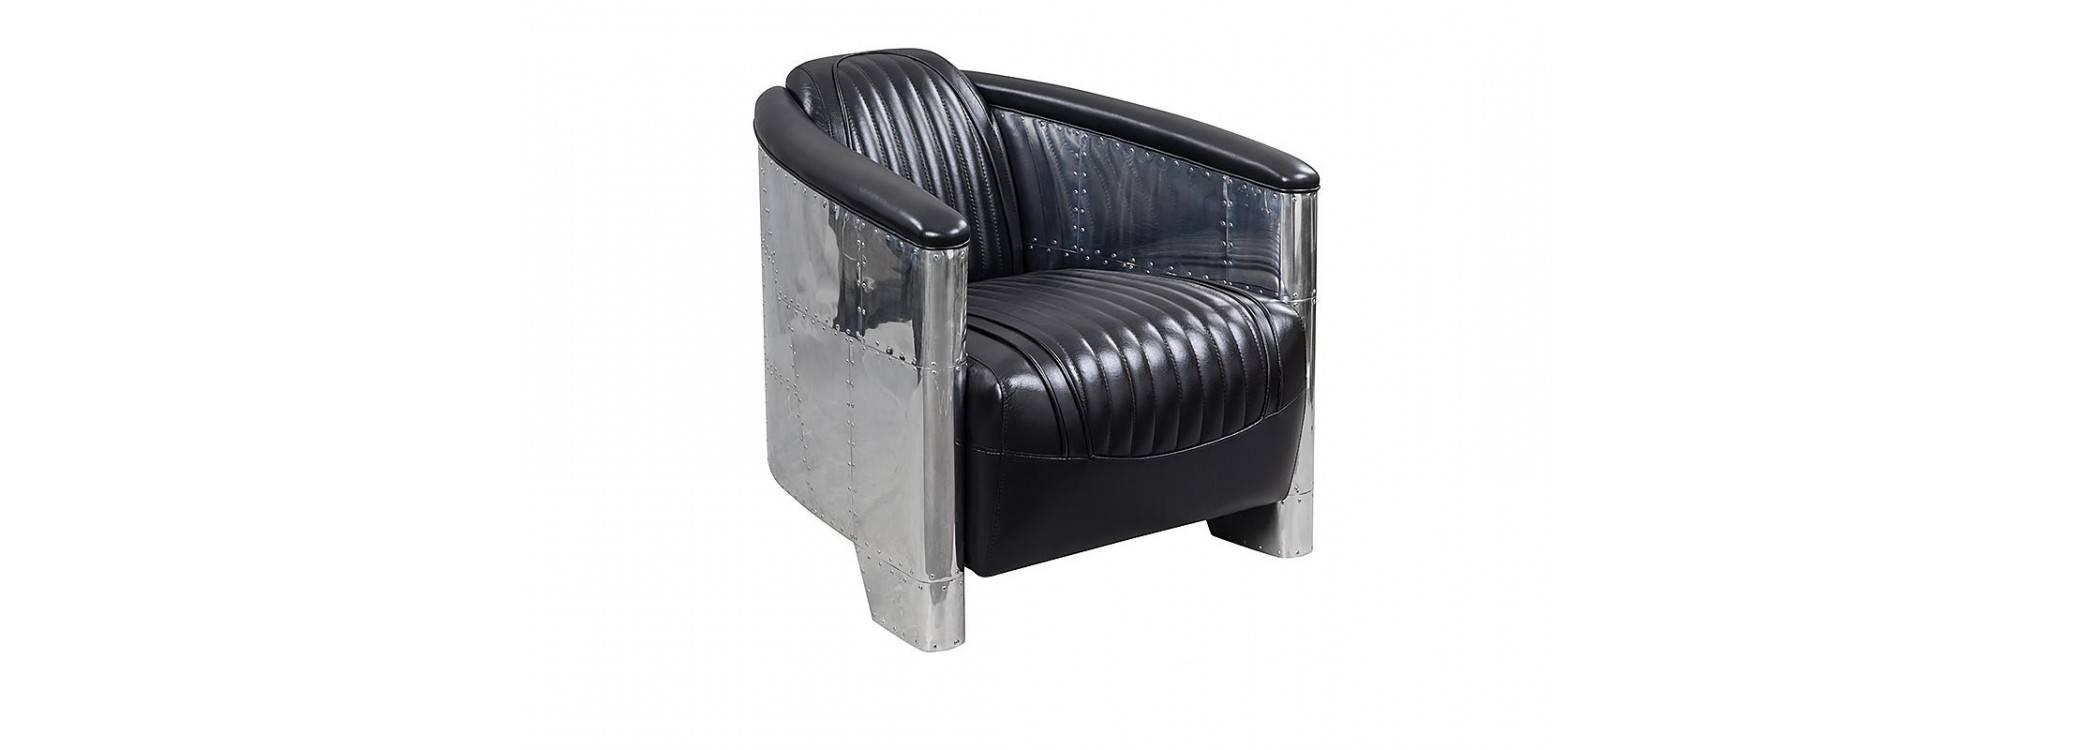 Aviator armchair - Black leather